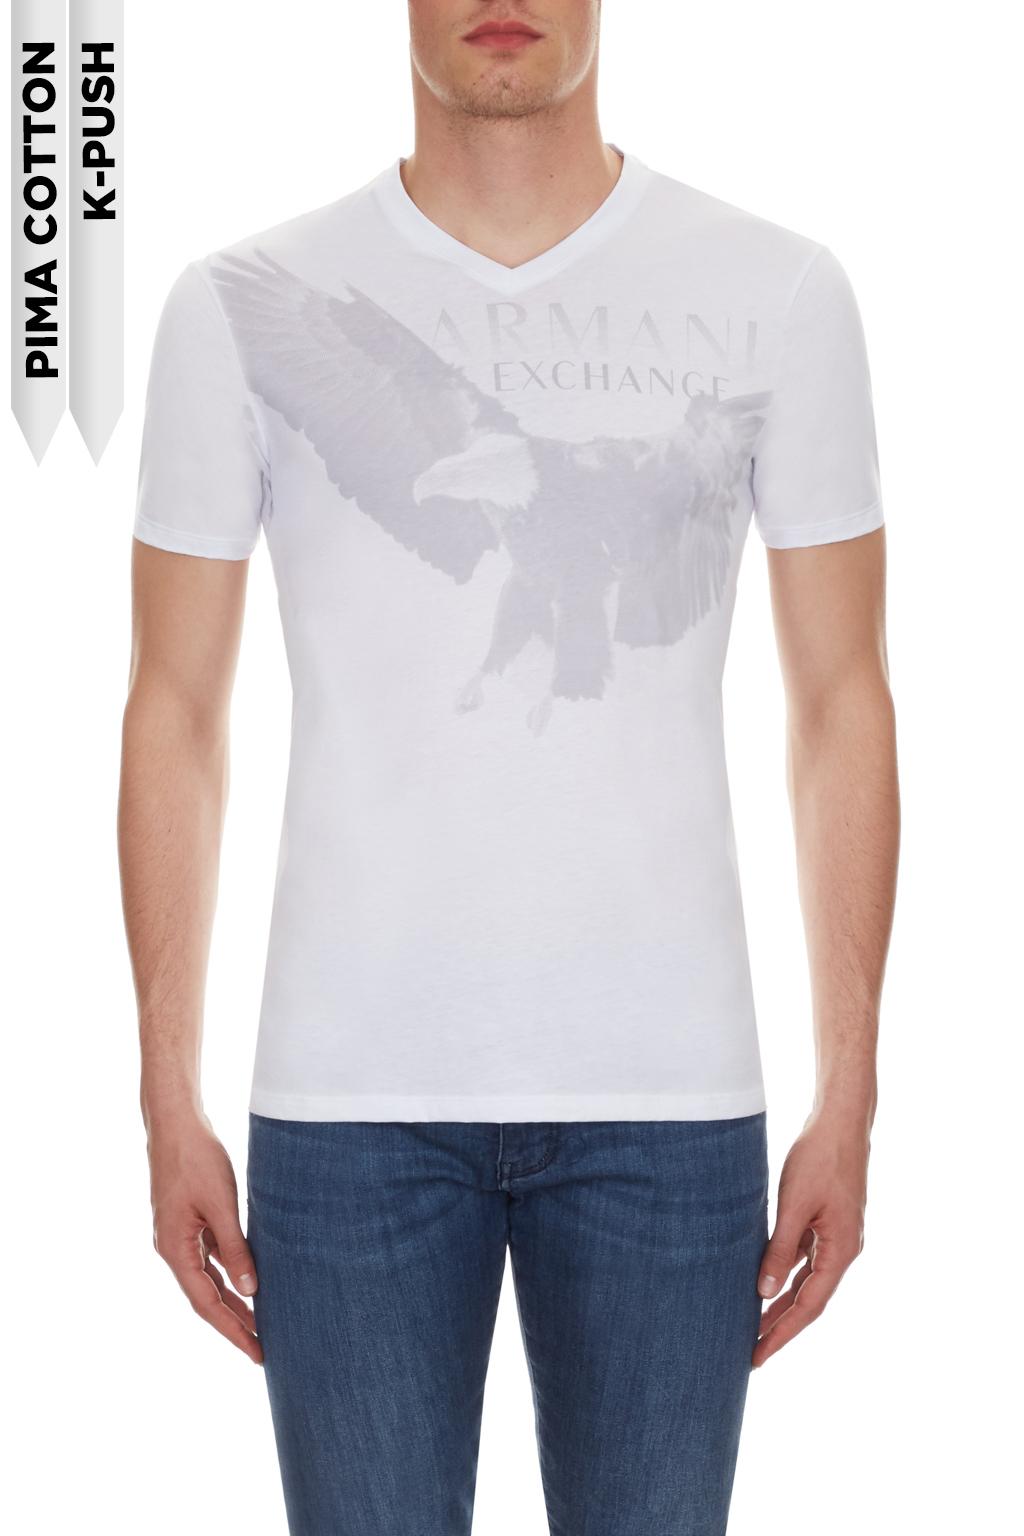 T-shirt uomo stampa aquila ARMANI EXCHANGE